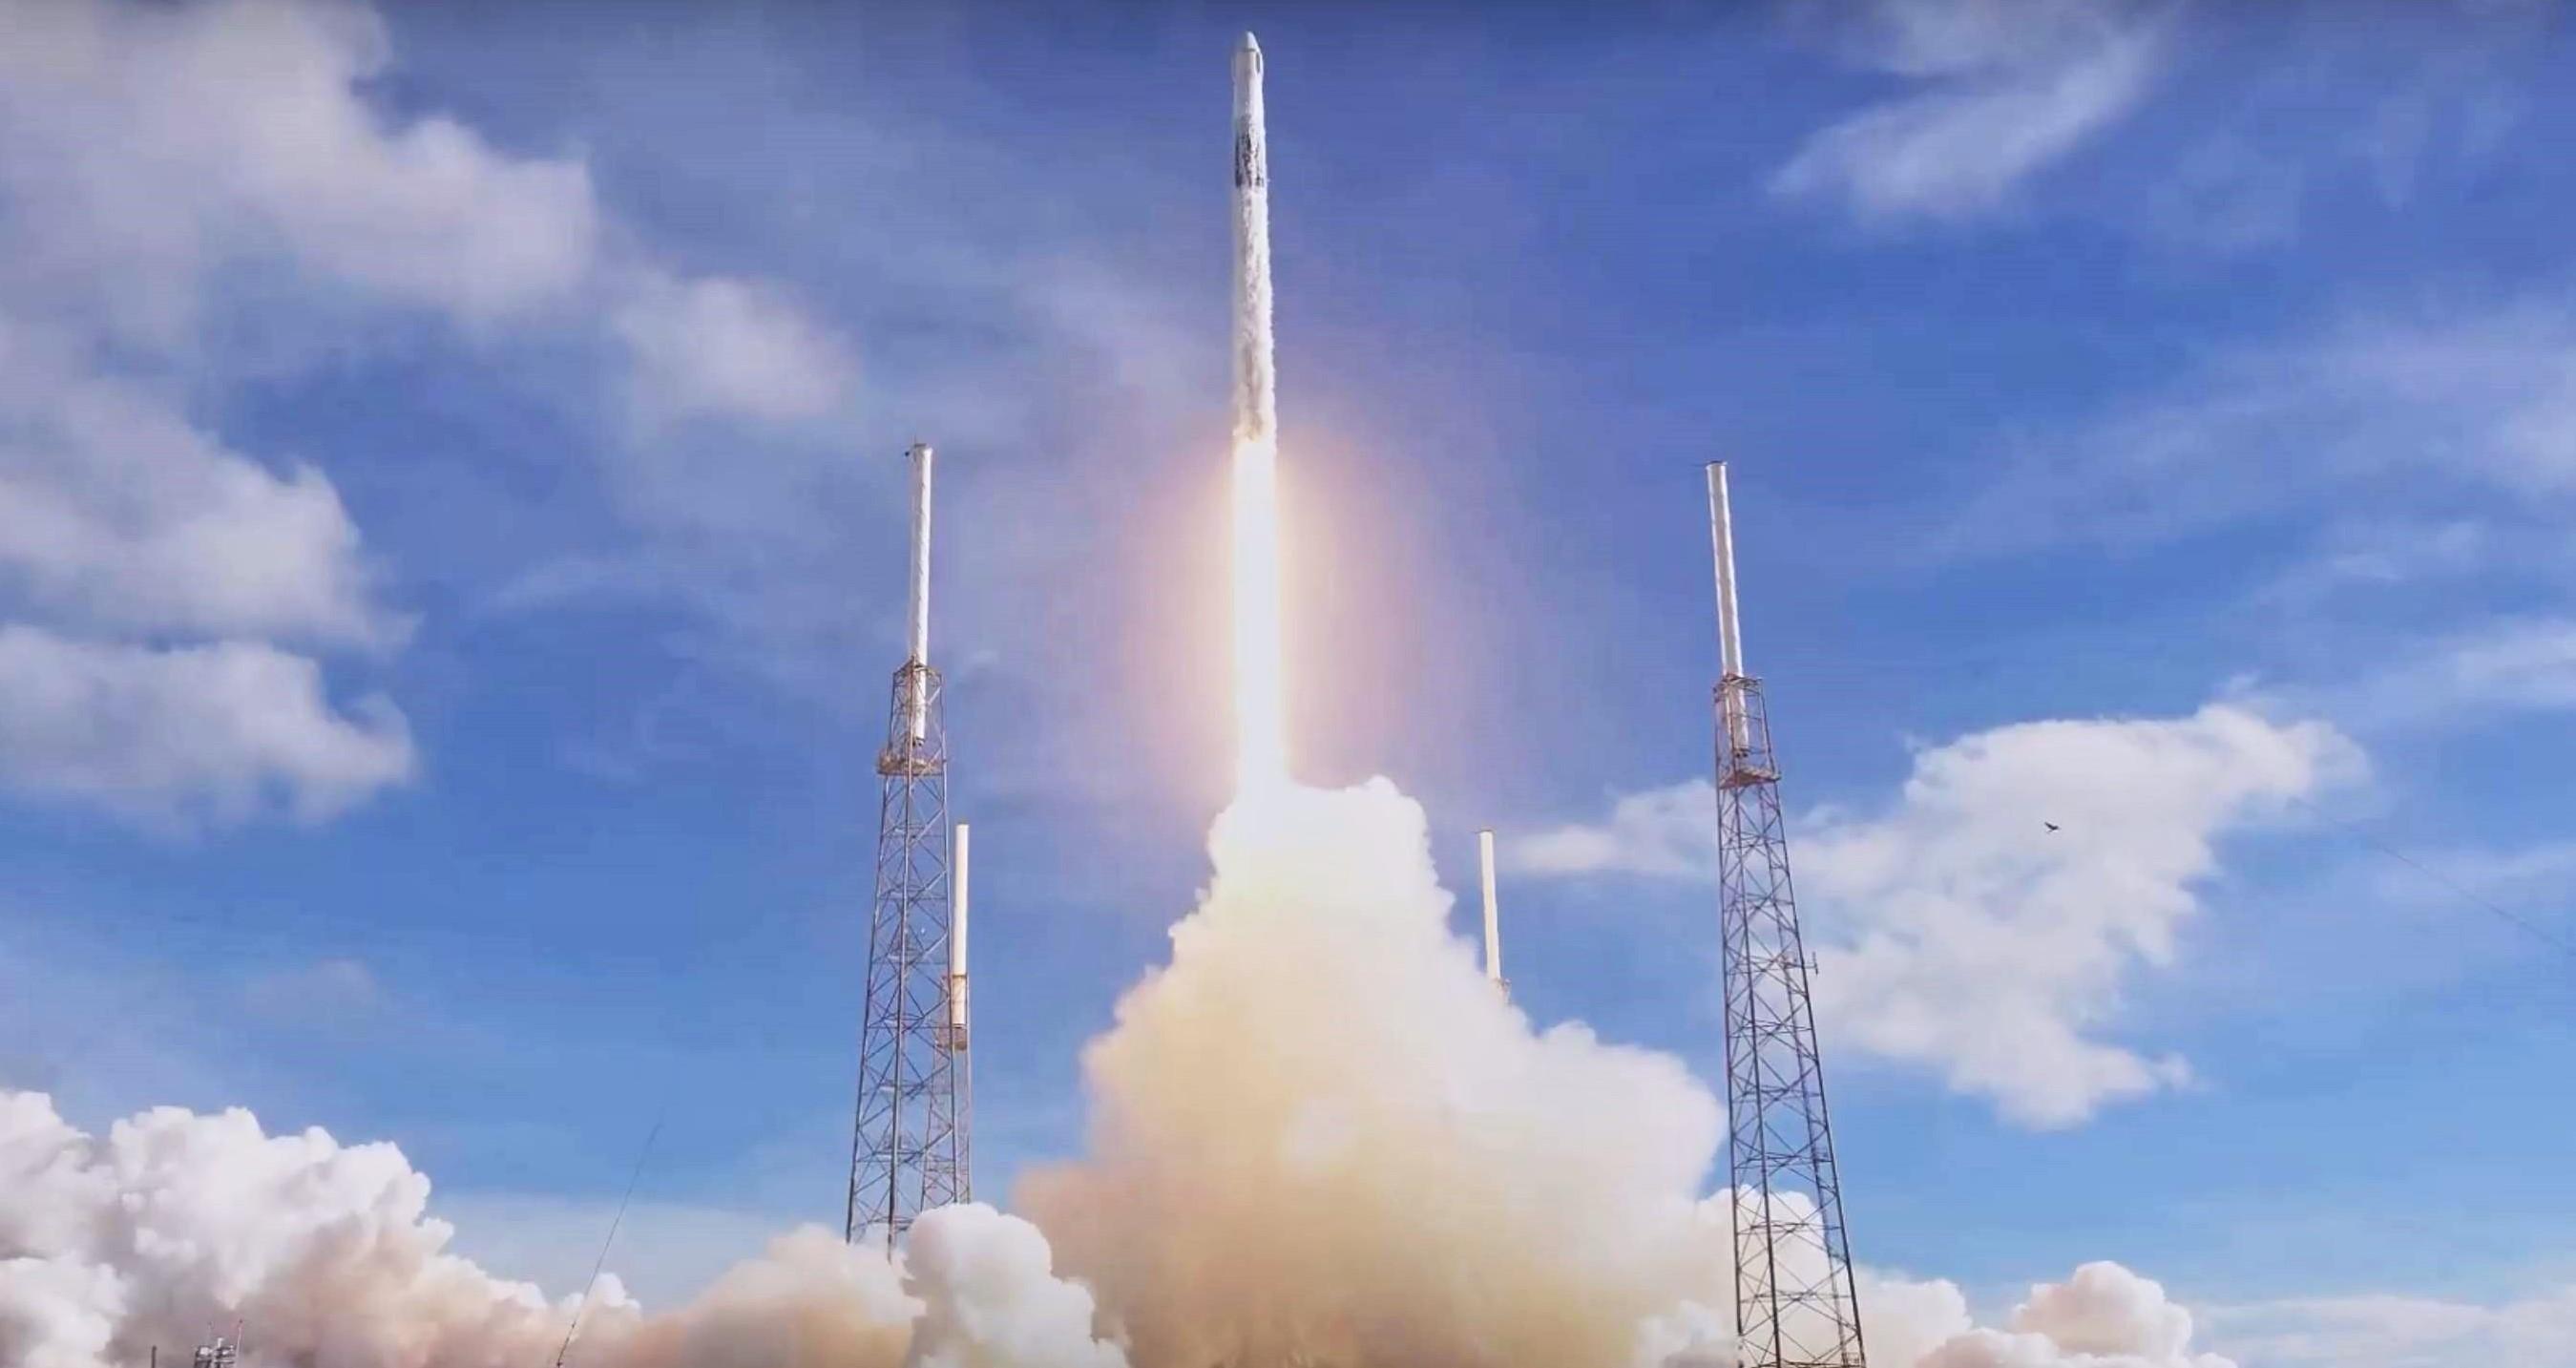 Cargo Dragon CRS-18 Falcon 9 B1056 (SpaceX) webcast 2 liftoff 4